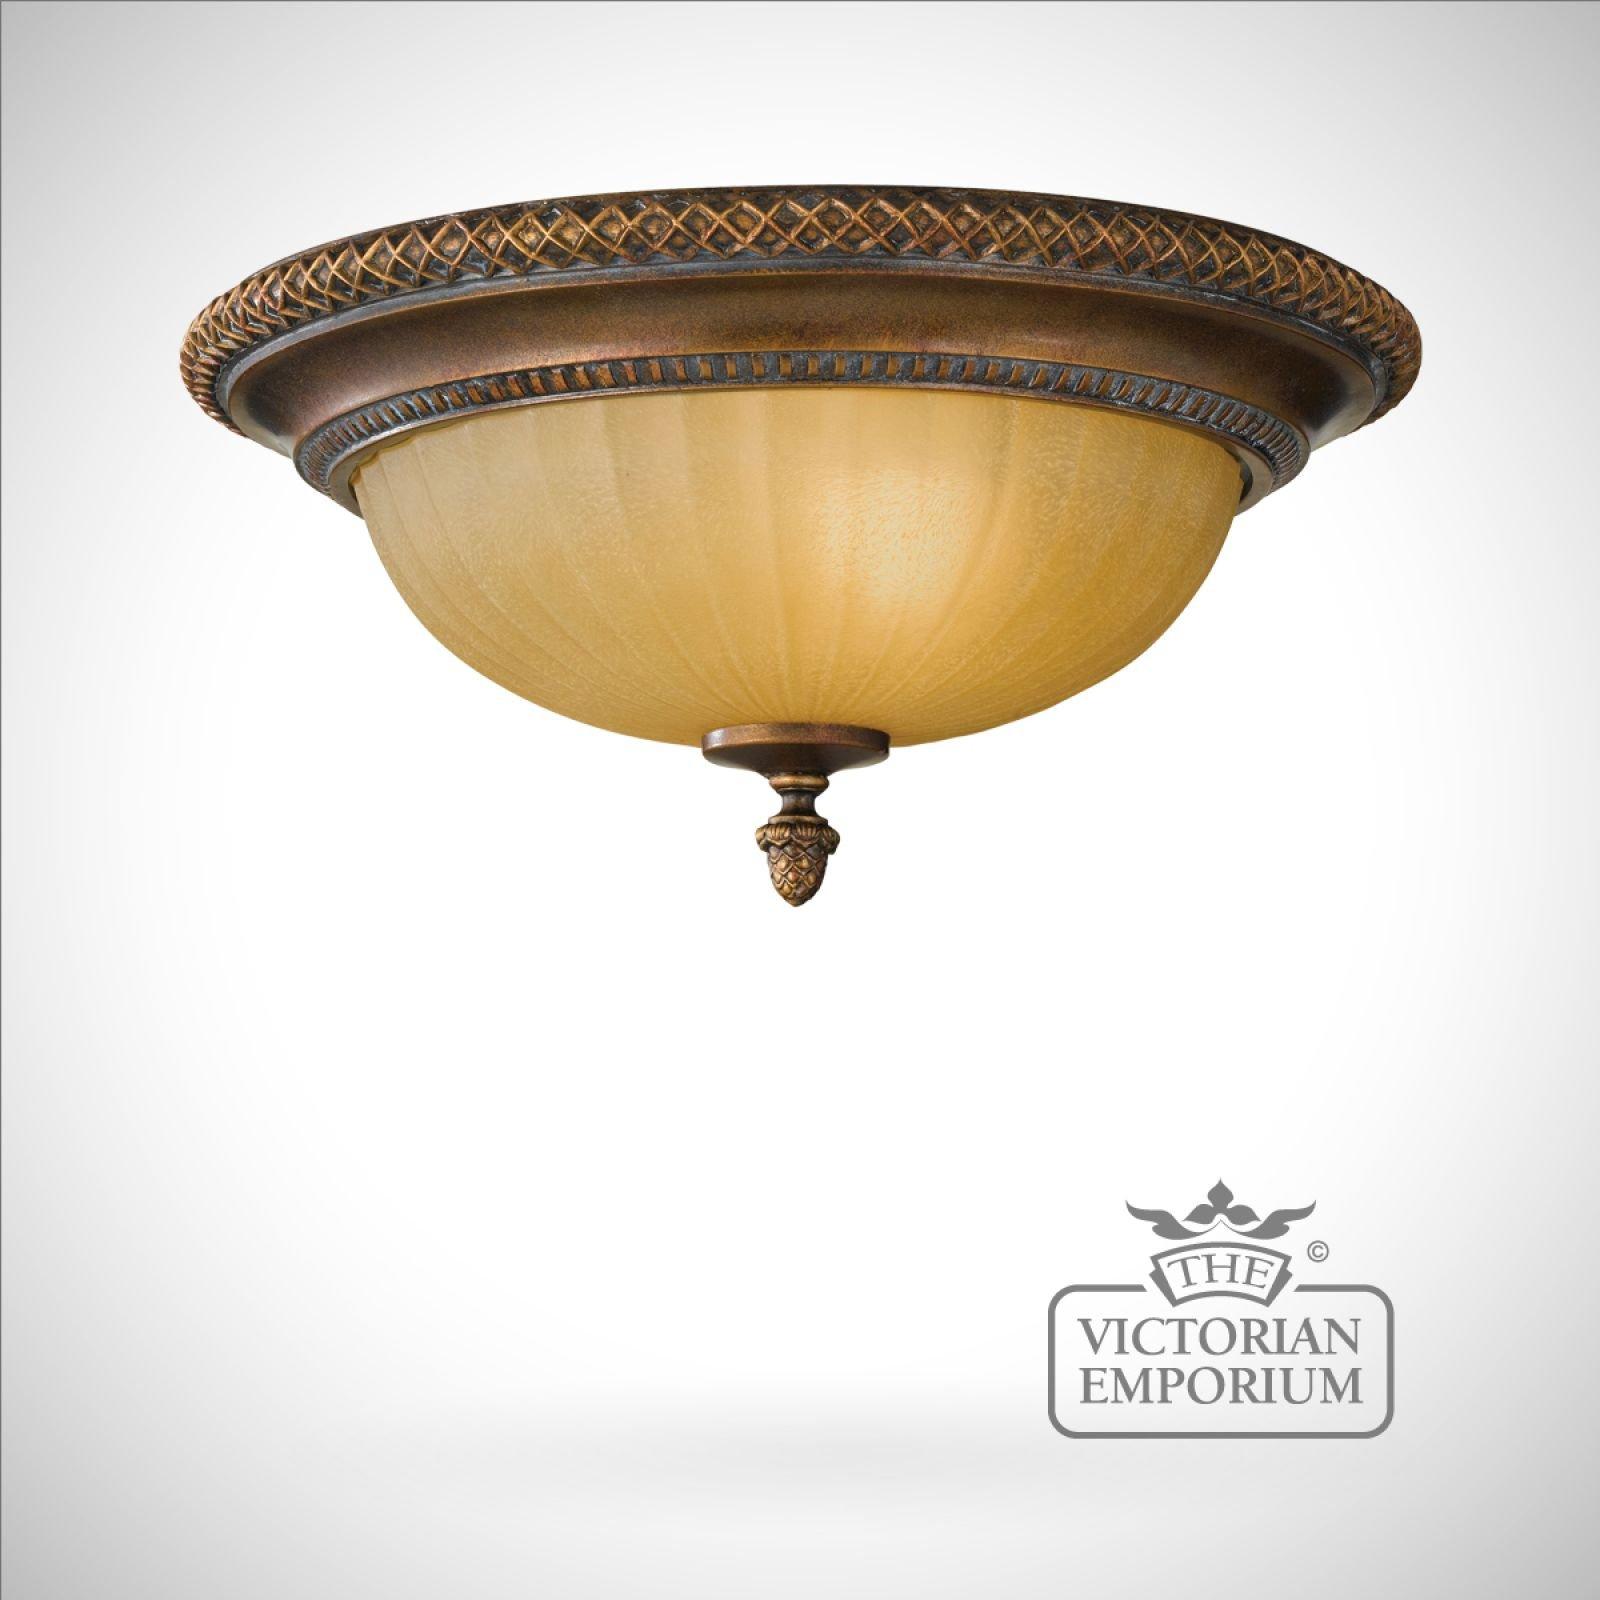 Victorian Flush Ceiling Light - AxSoris.